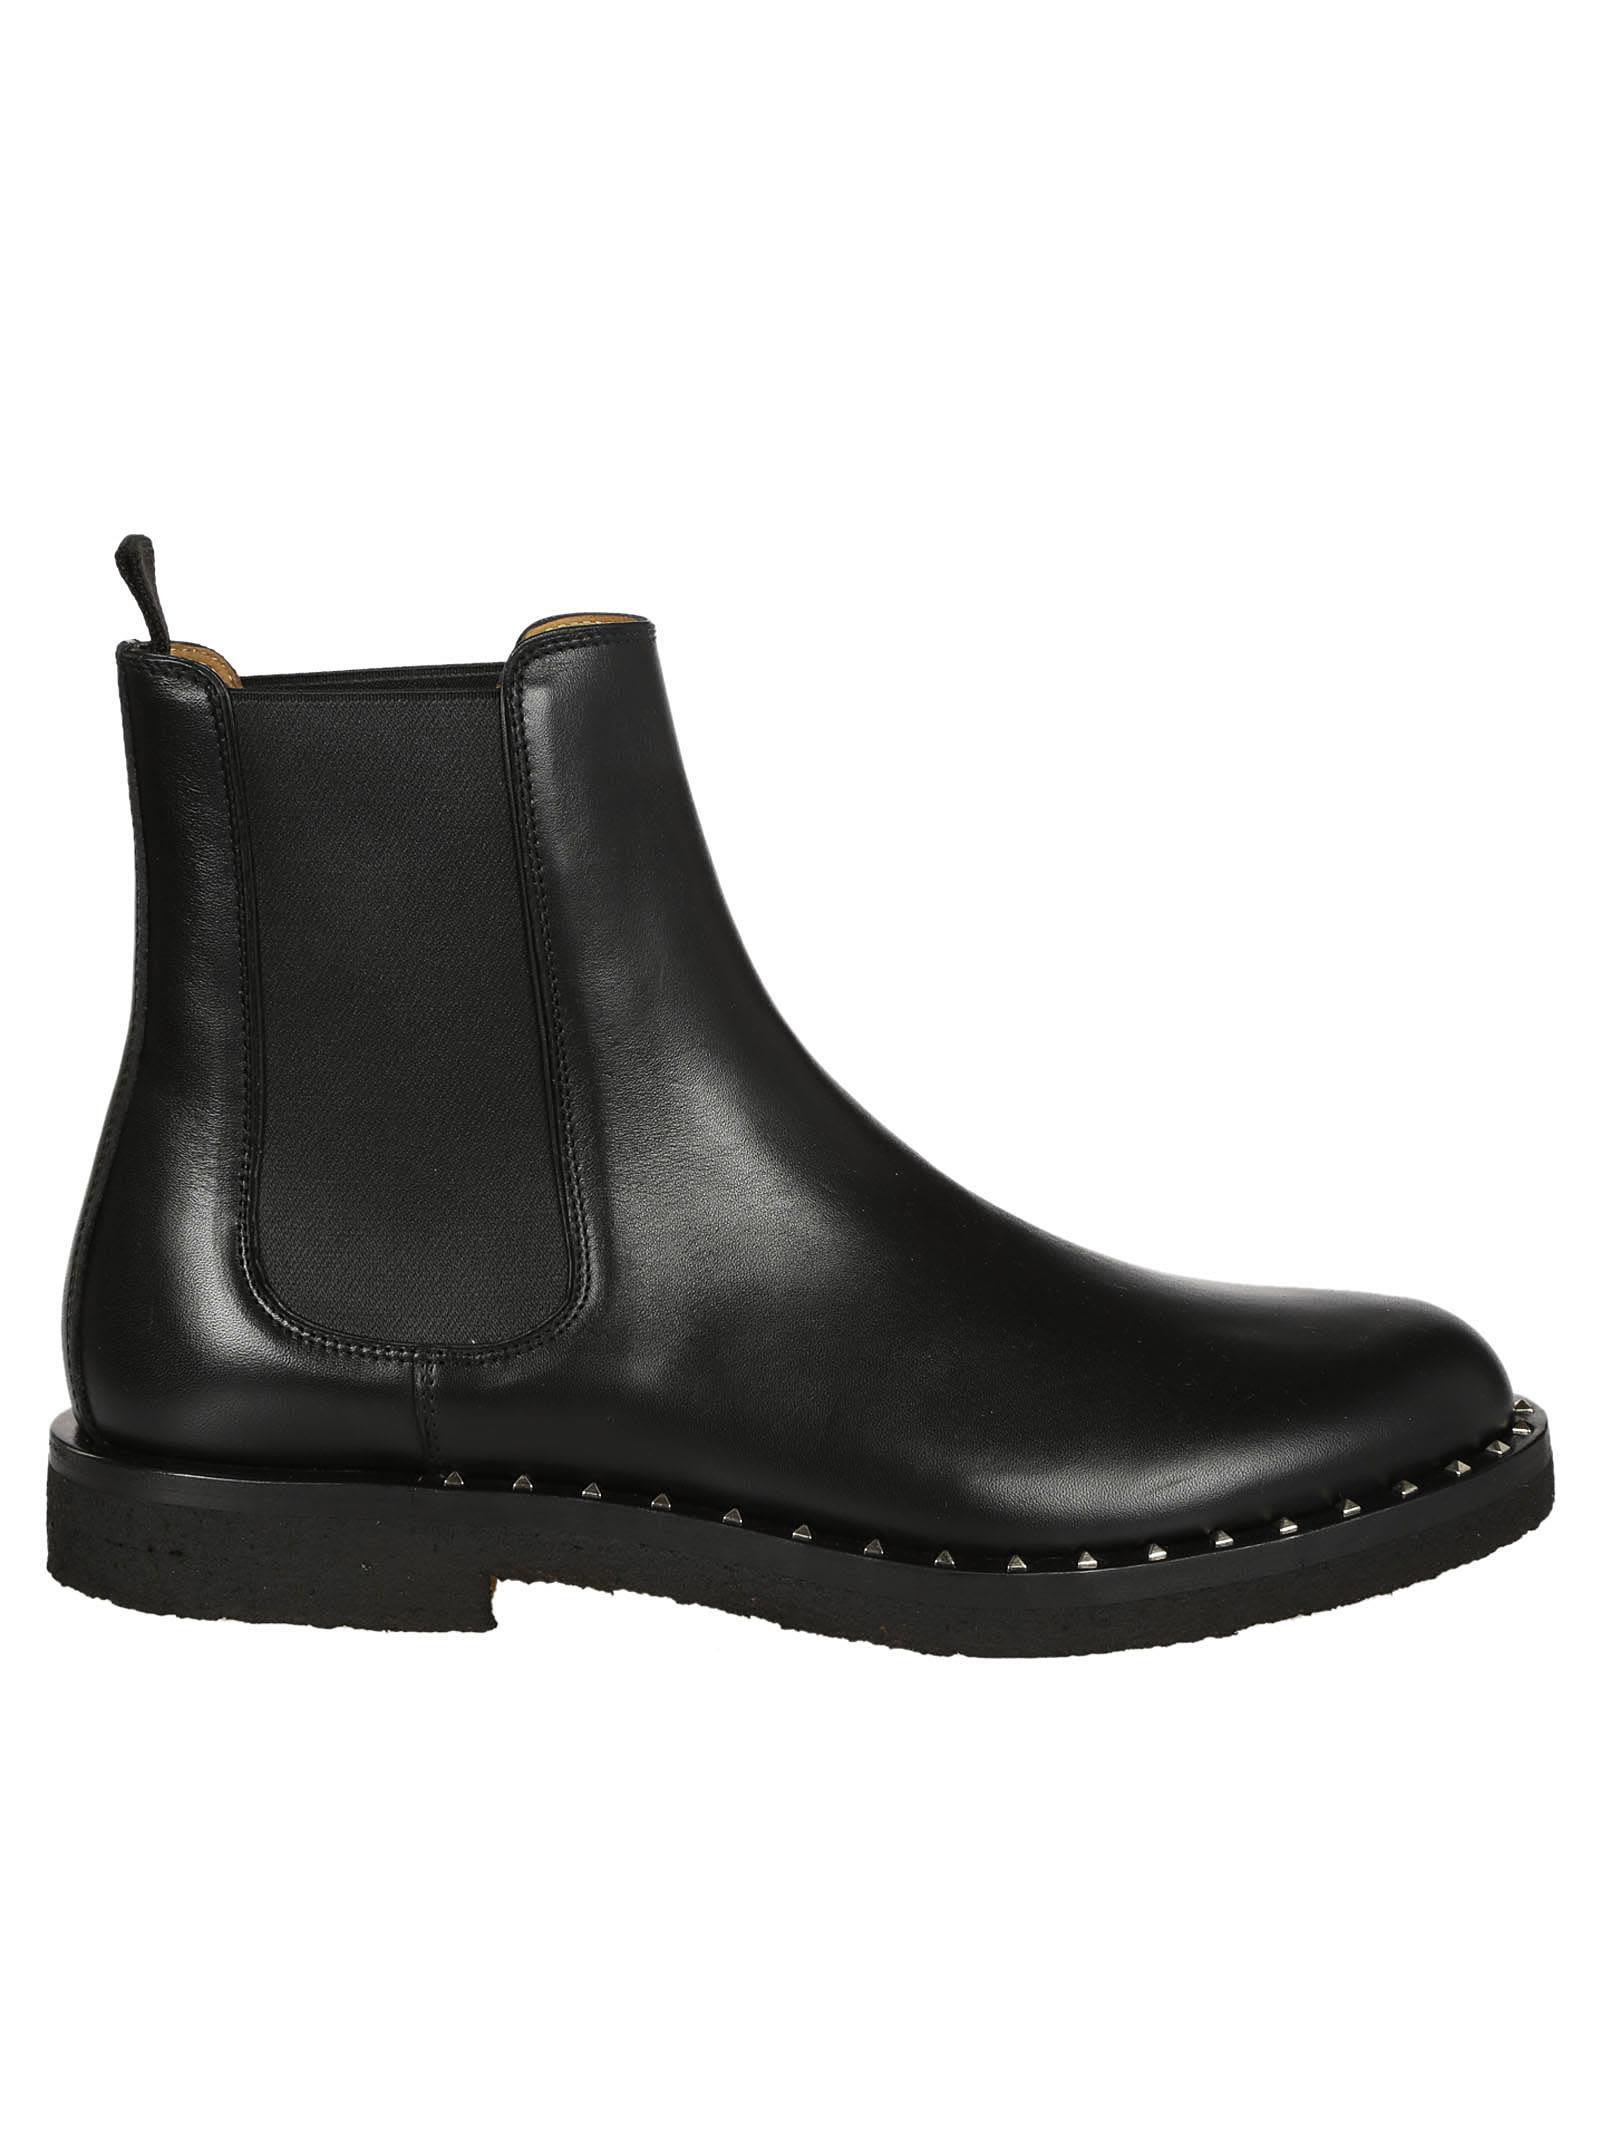 e74cbbc595 Valentino Garavani Valentino Garavani Soul Rockstud Boots - Black ...